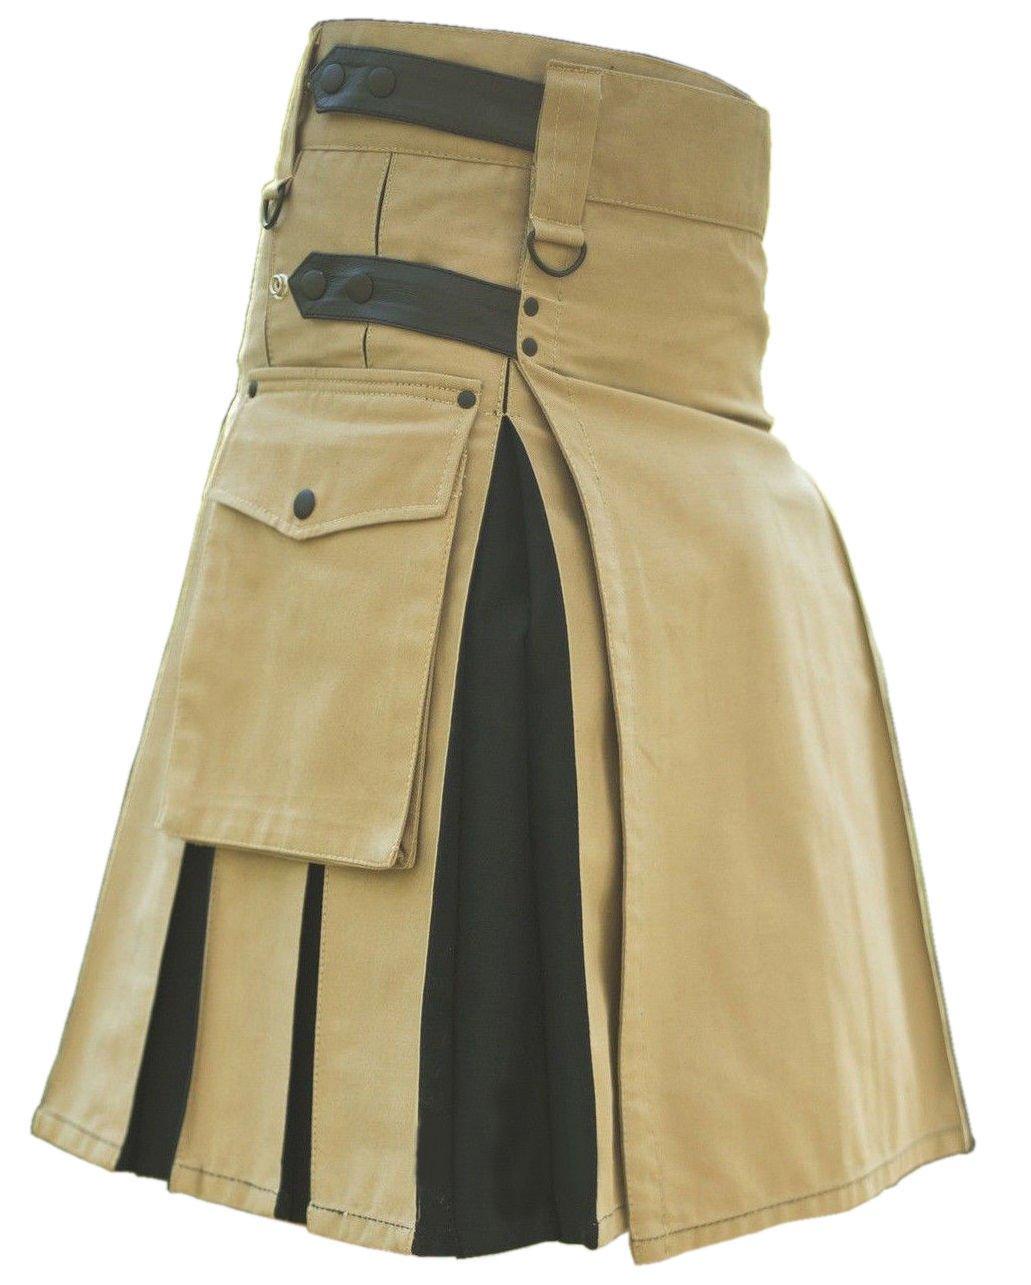 New DC Handmade Black & khaki Cotton Utility Style Hybrid Kilt for Men with Leather straps size 44